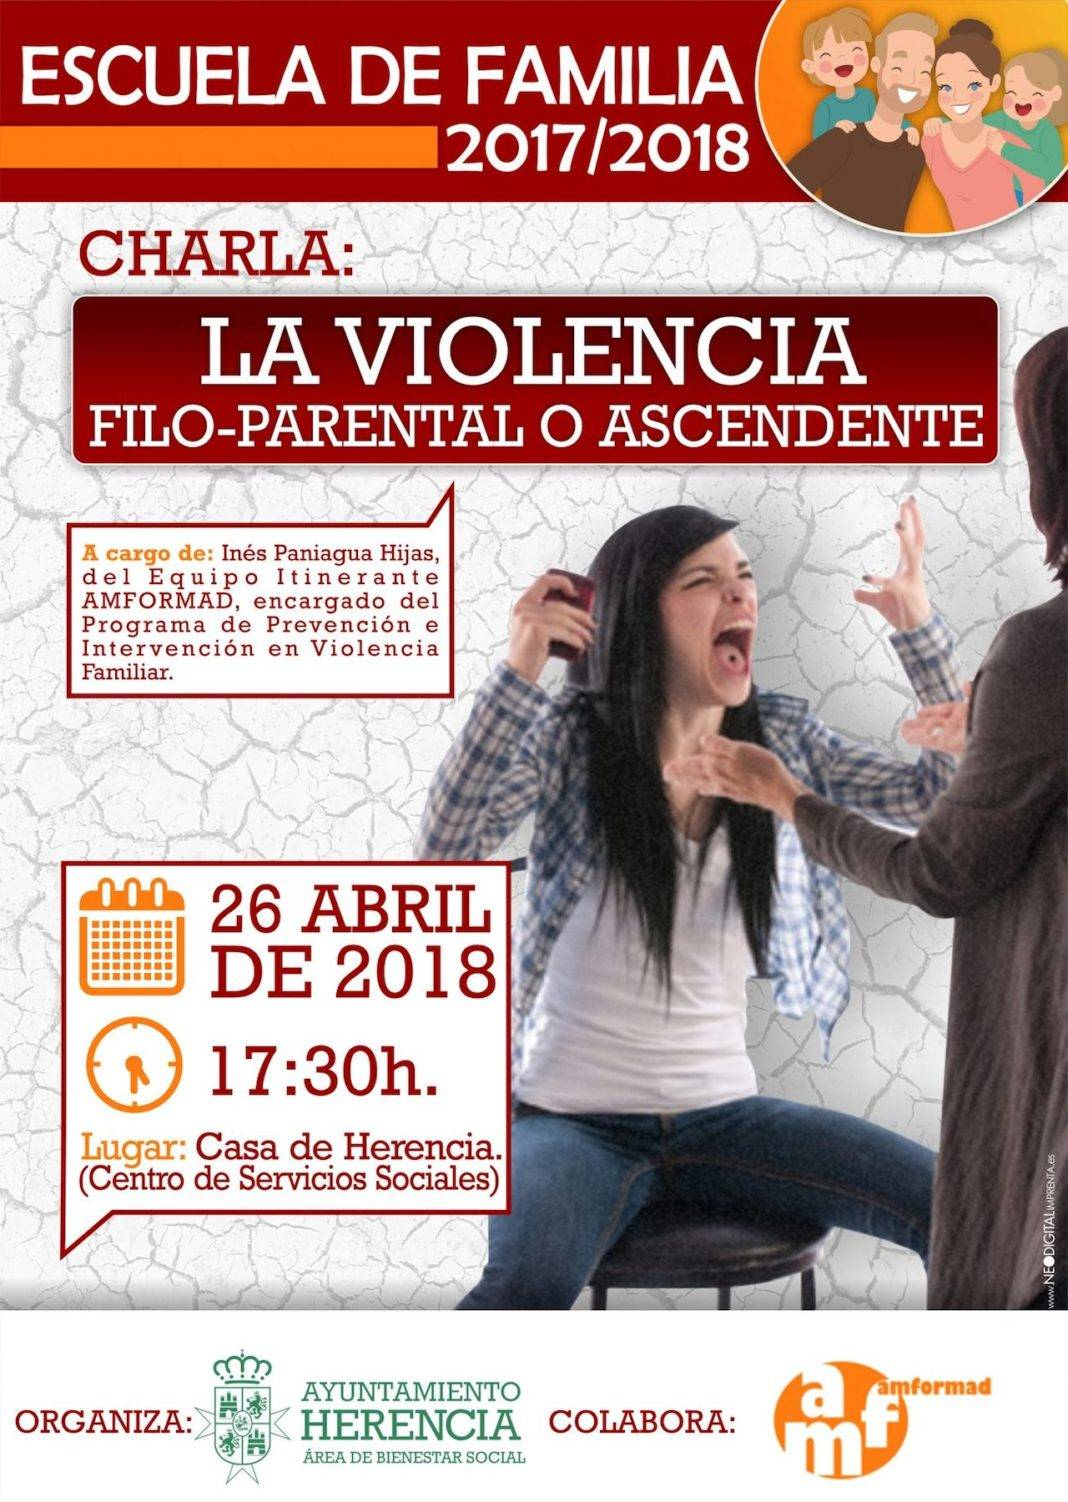 escuela familia violencia familiar 1068x1502 - La Escuela de Familia finaliza su temporada 2017/2018